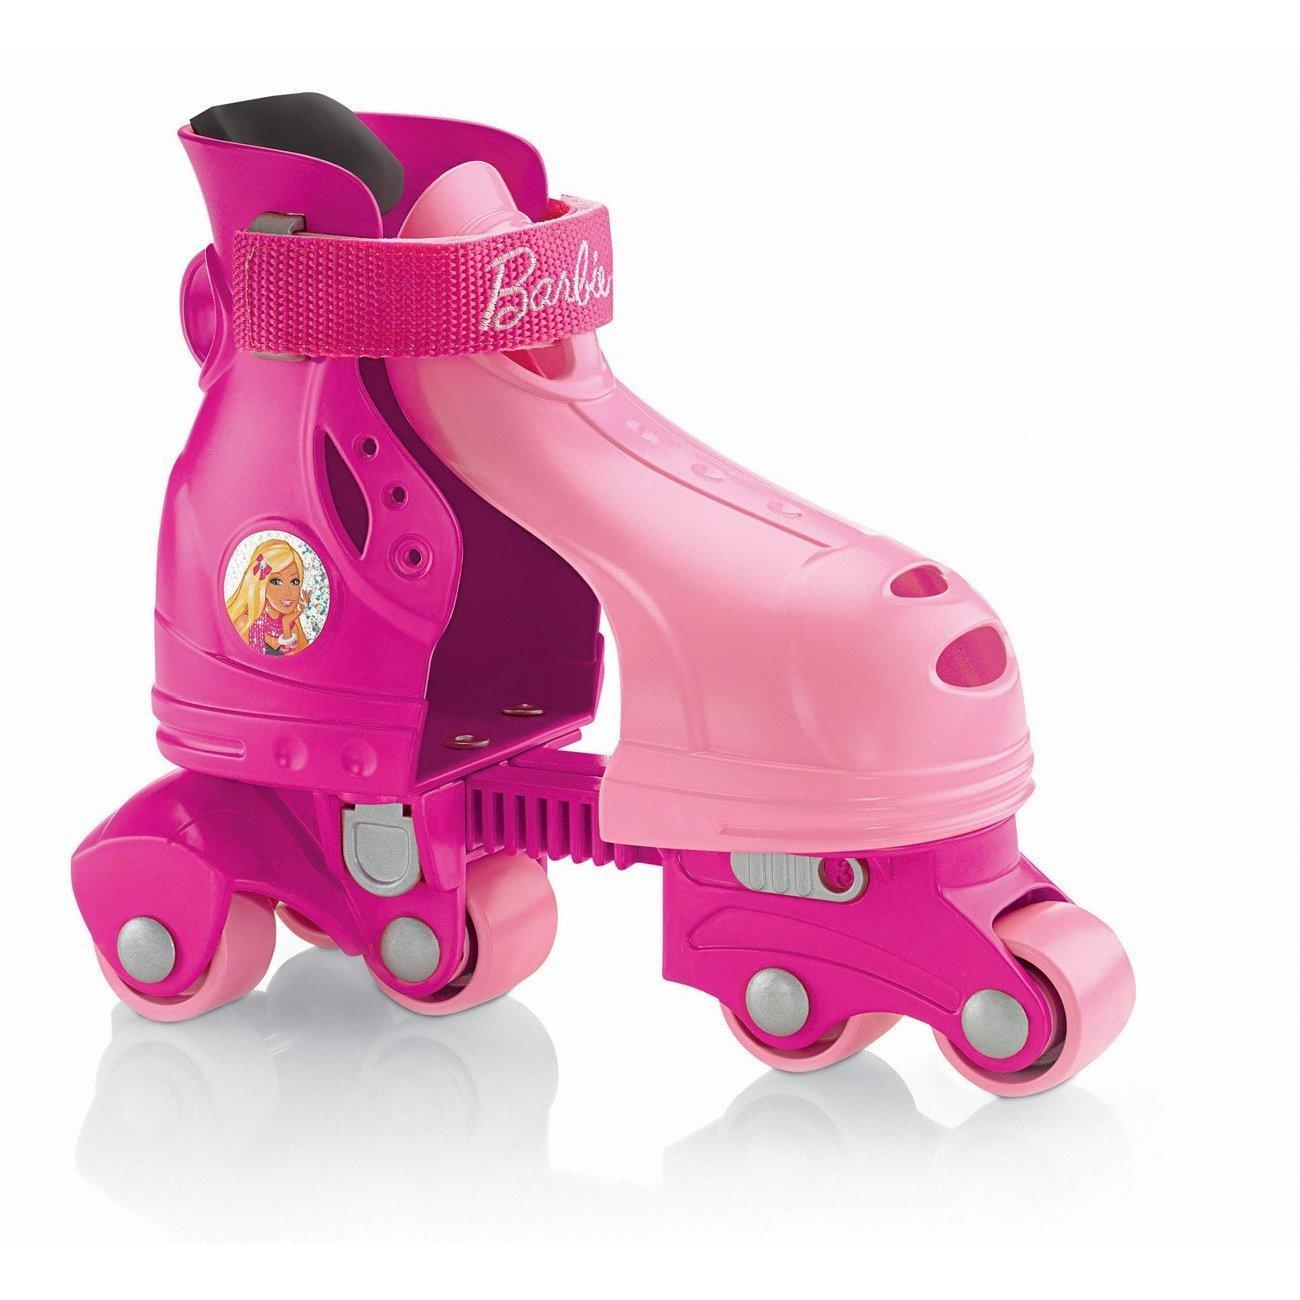 Giay truot patin can bang cho be gai Barbie Grow With Me